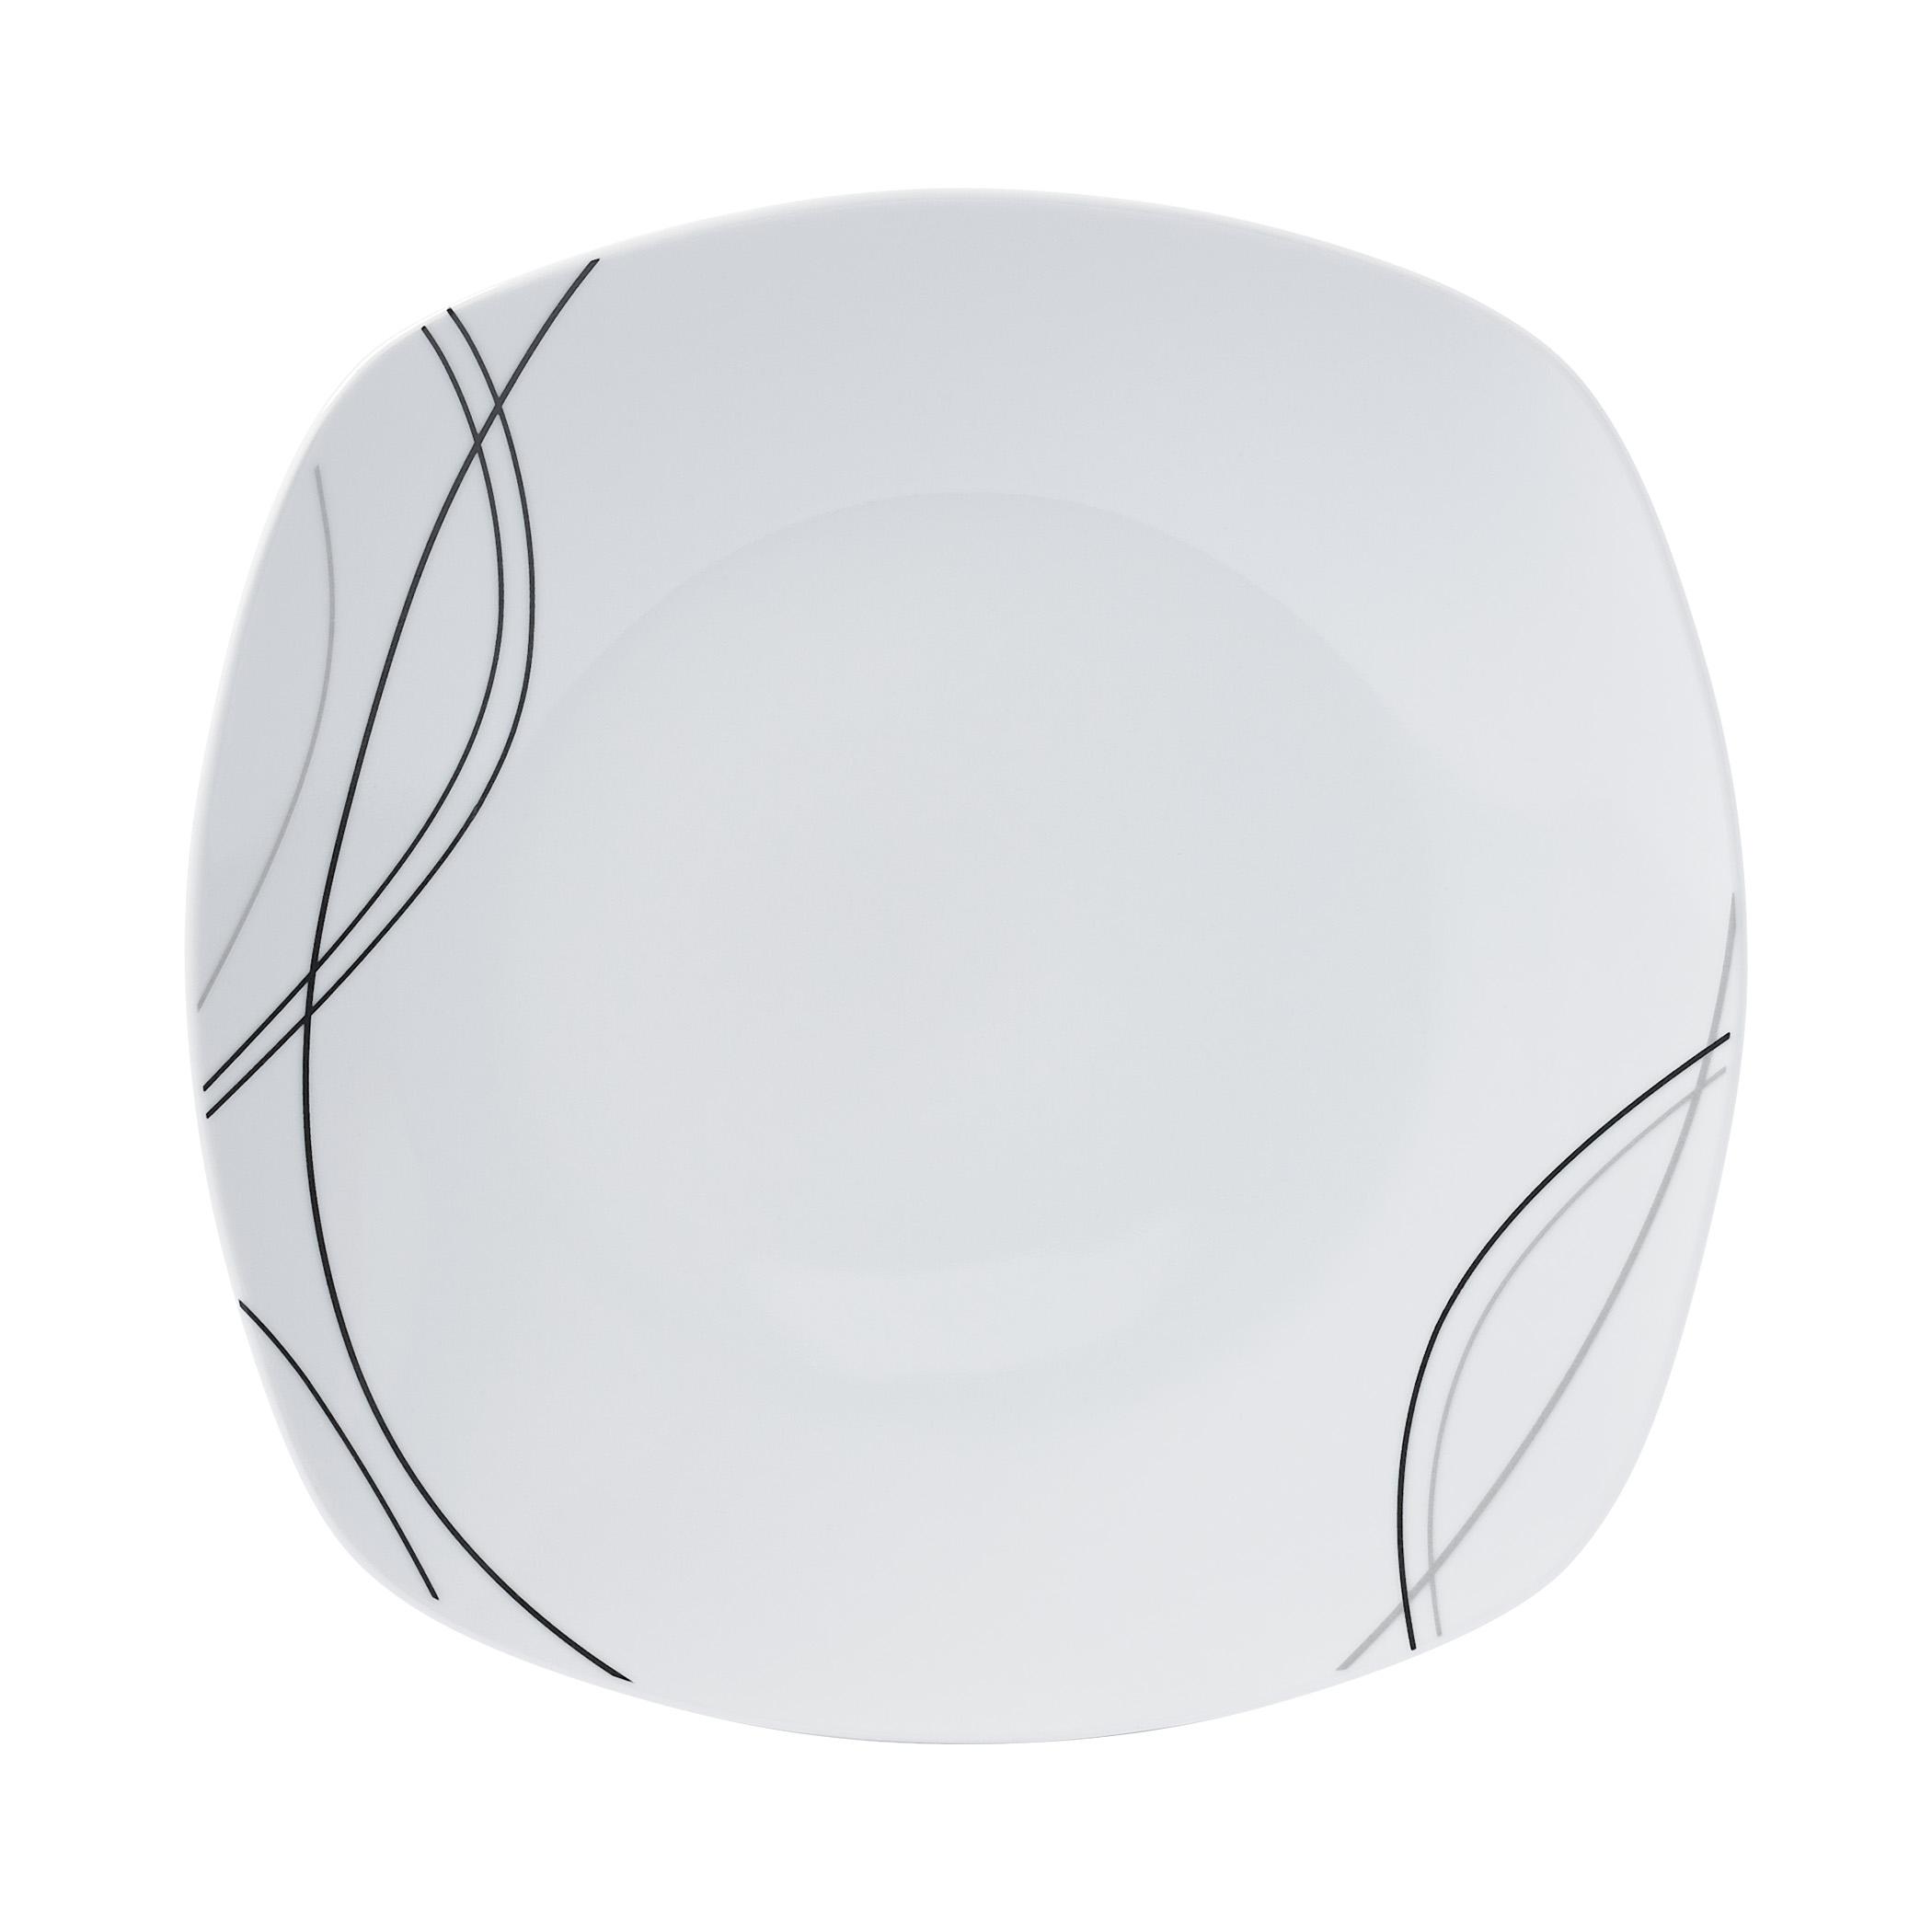 White Square Dinnerware Sets